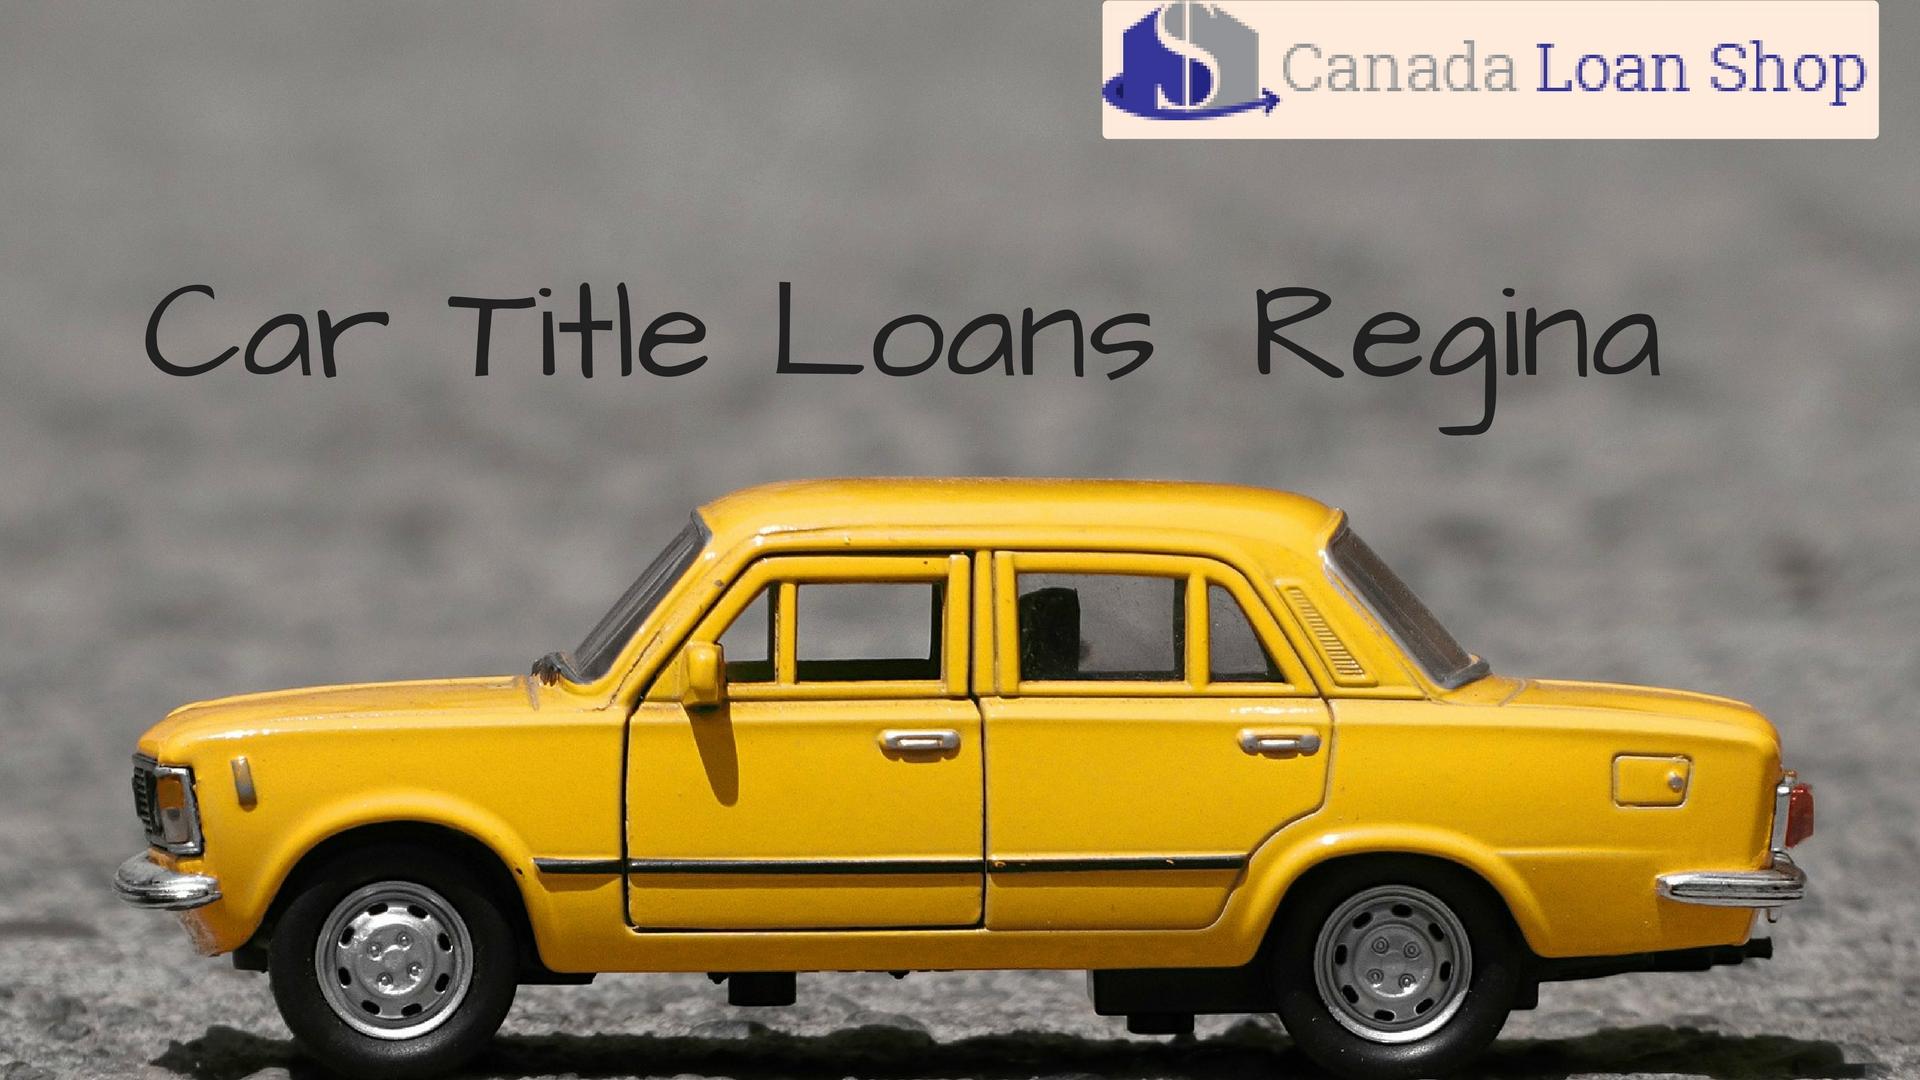 Car Title Loans Regina